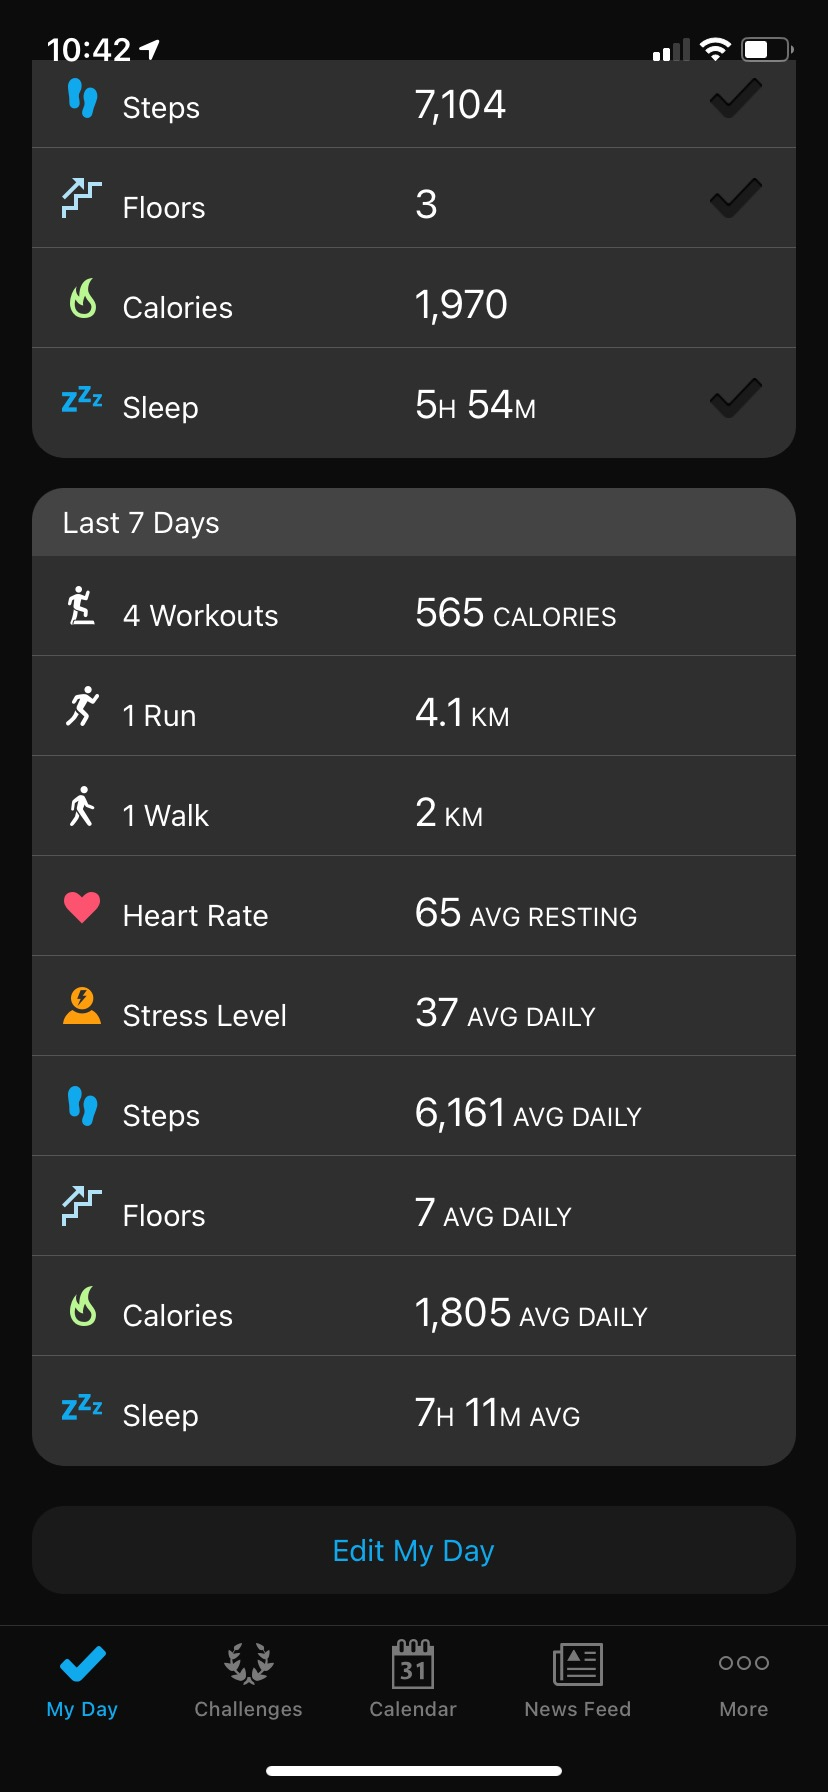 Garmin Connect iQ app last 7 days